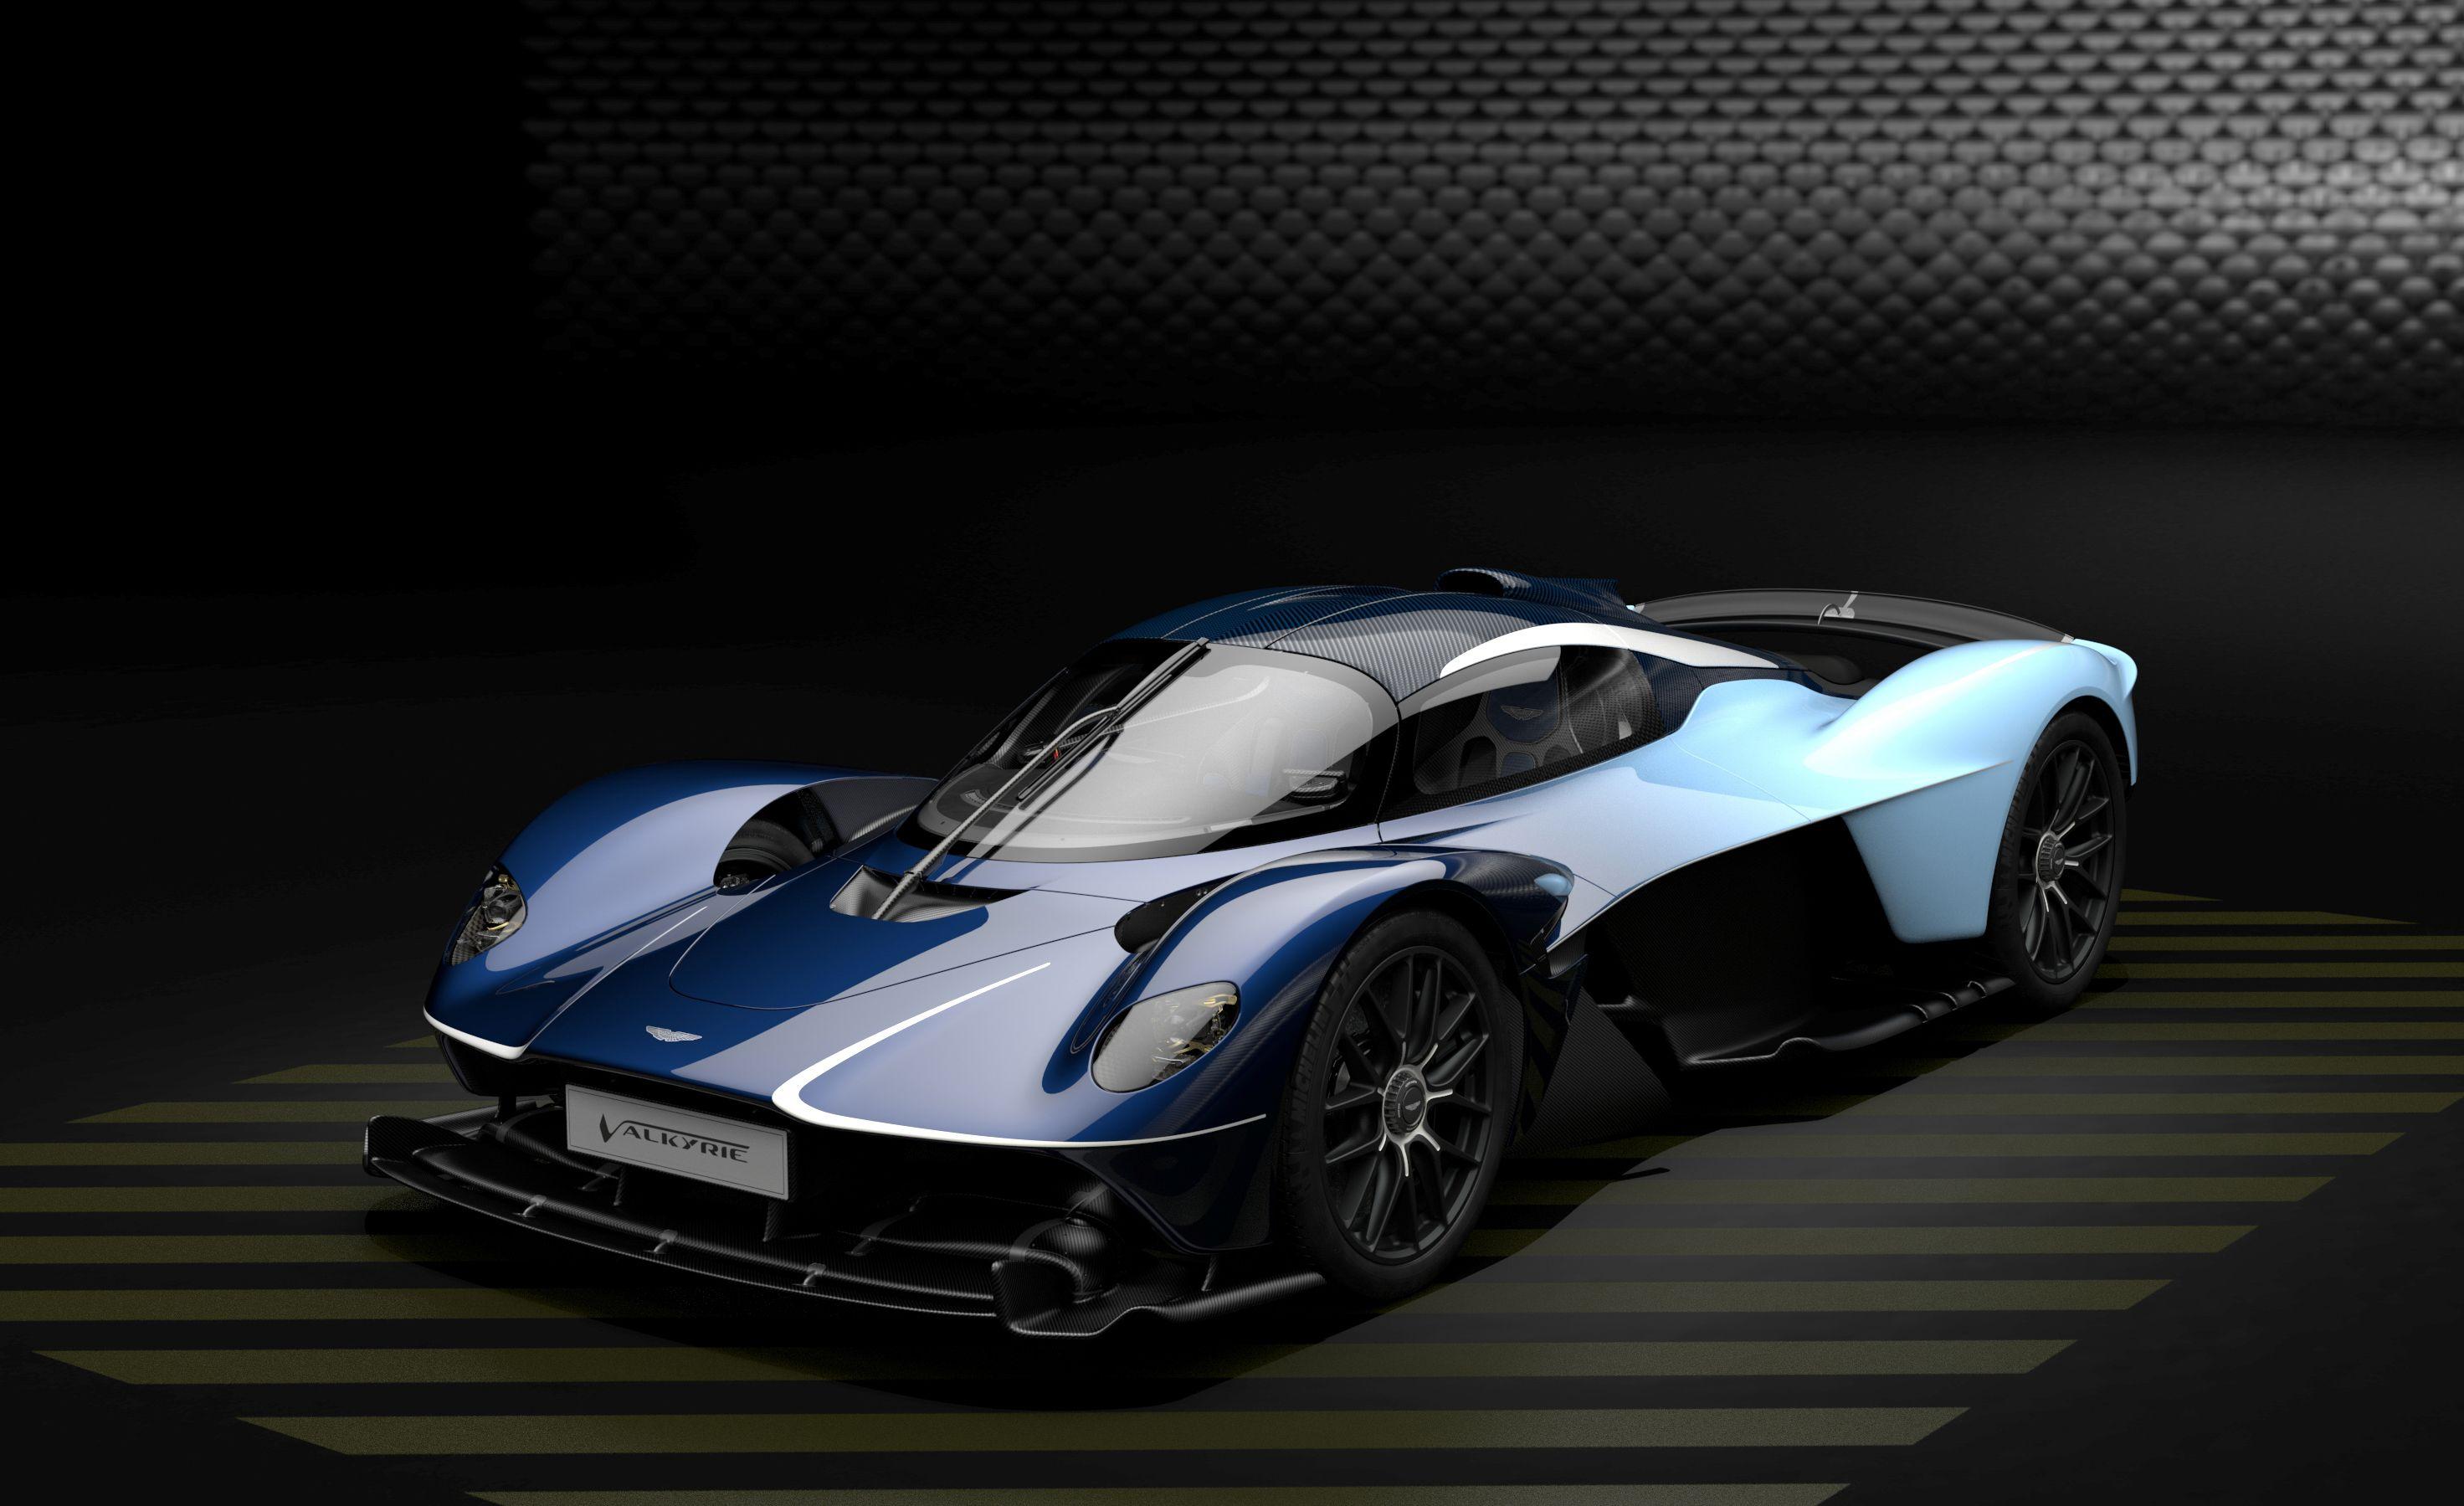 2022 Aston Martin Valkyrie What We Know So Far